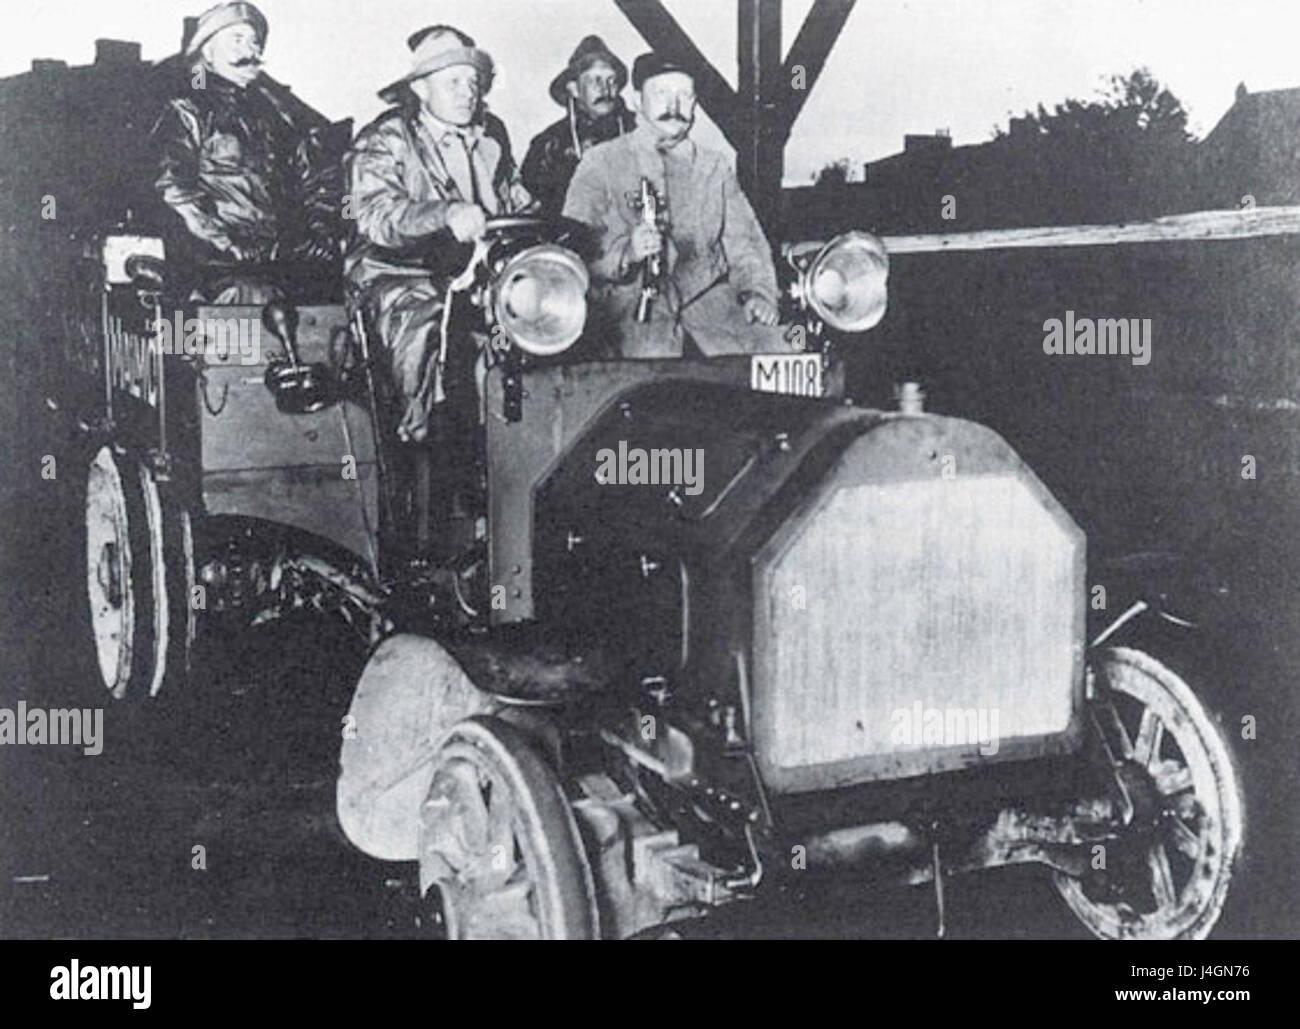 SCANIA test SKF lager 1909 150dpi - Stock Image